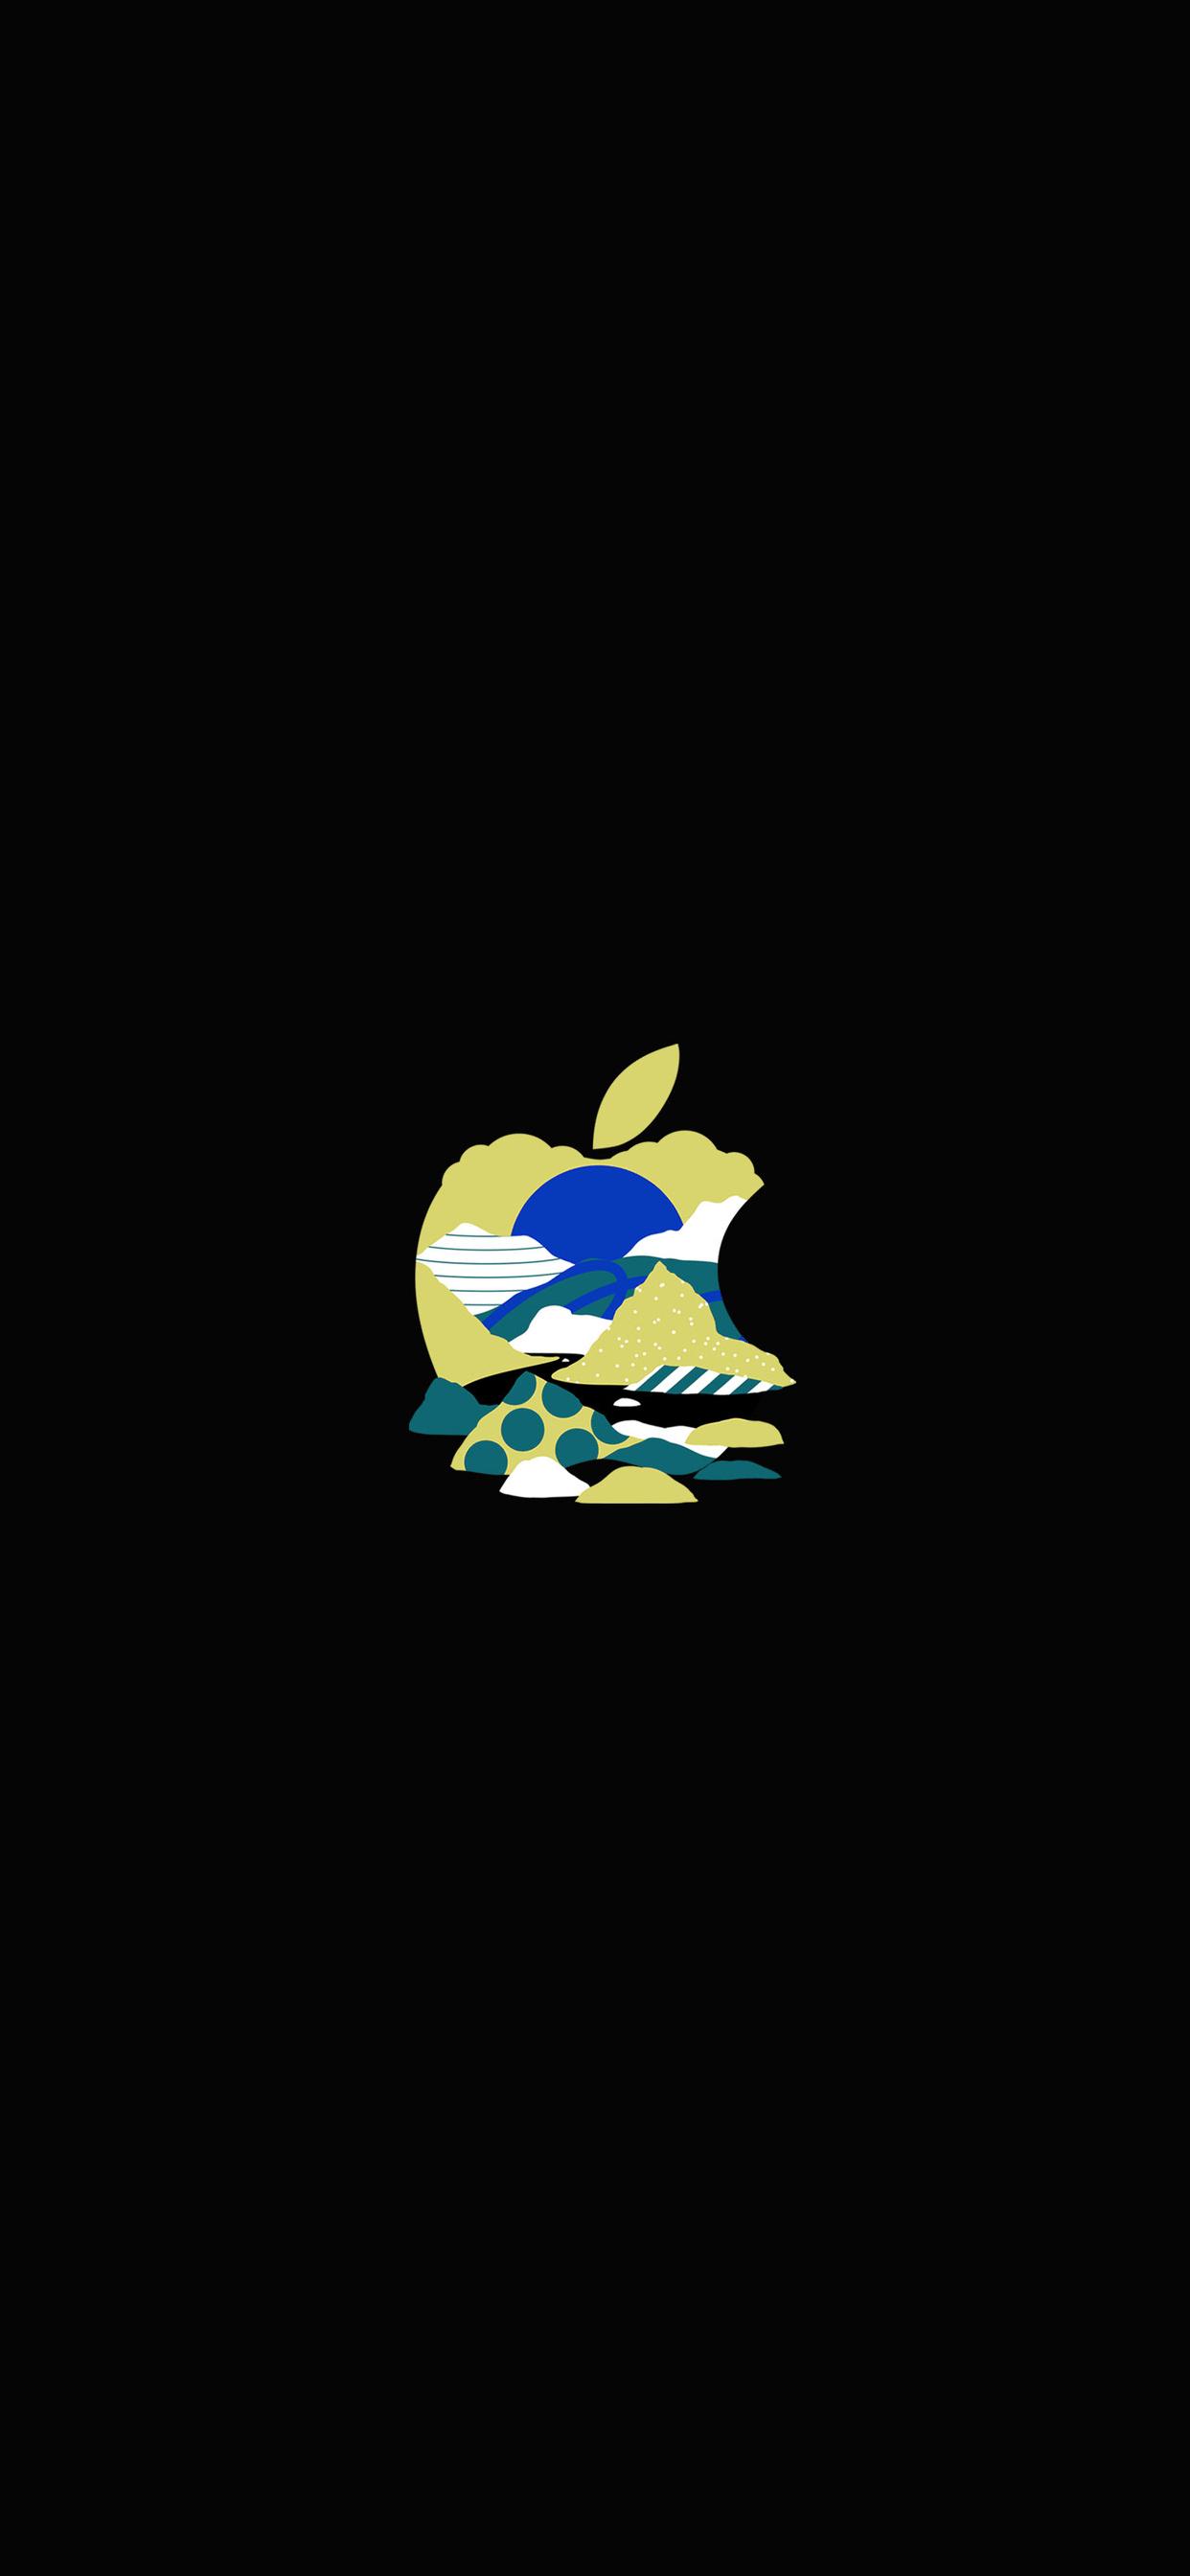 iPhone wallpaper apple logo 7 Apple logo